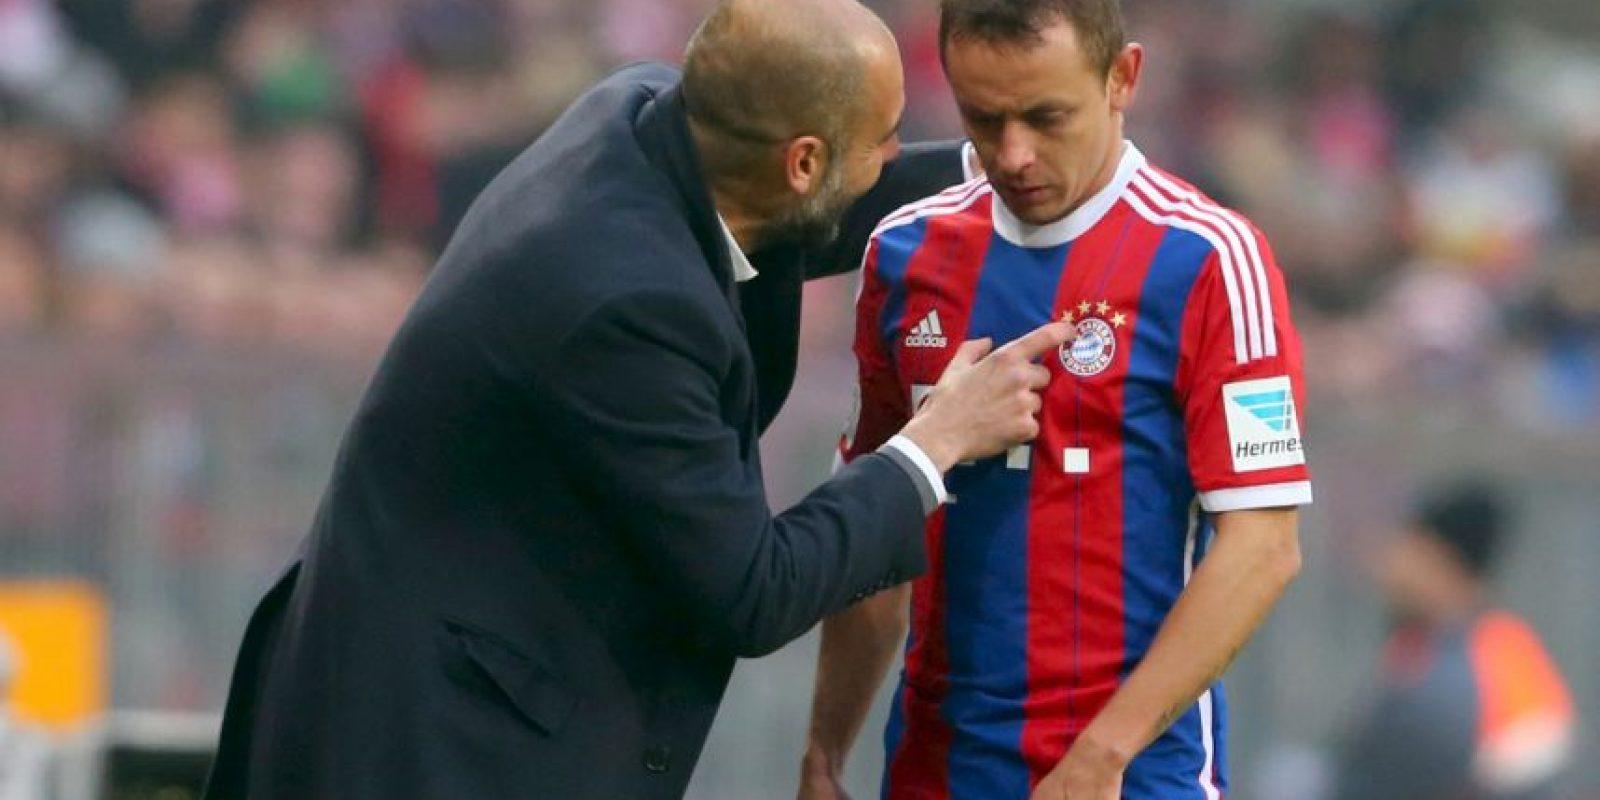 Del técnico Pep Guardiola Foto:Getty